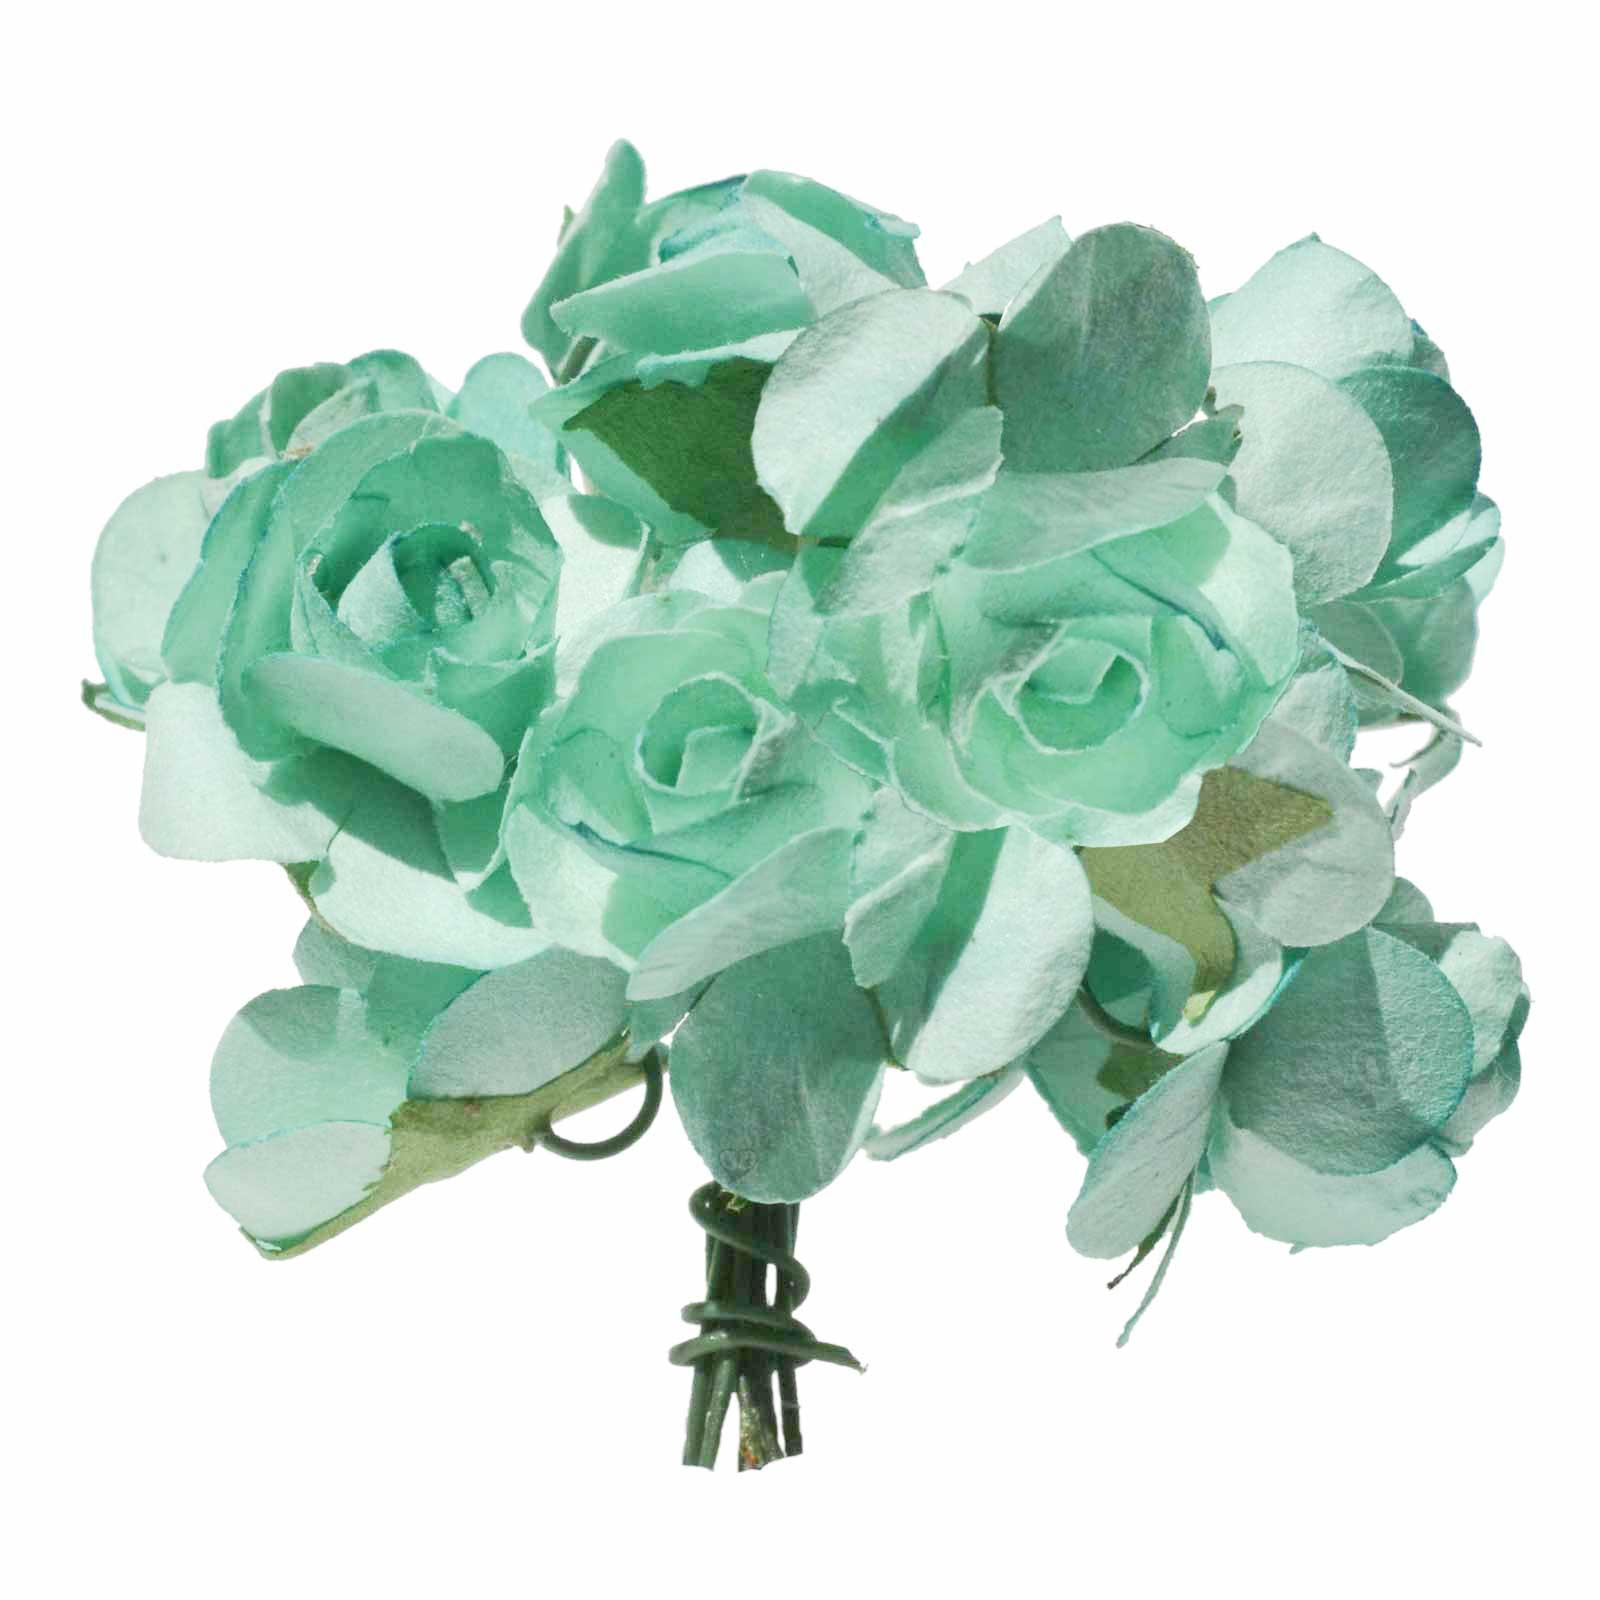 1 Bündel je 12 Rosen Röschen, Länge 7cm, Dekoration, Floristik, Farbe wählbar – Bild 5